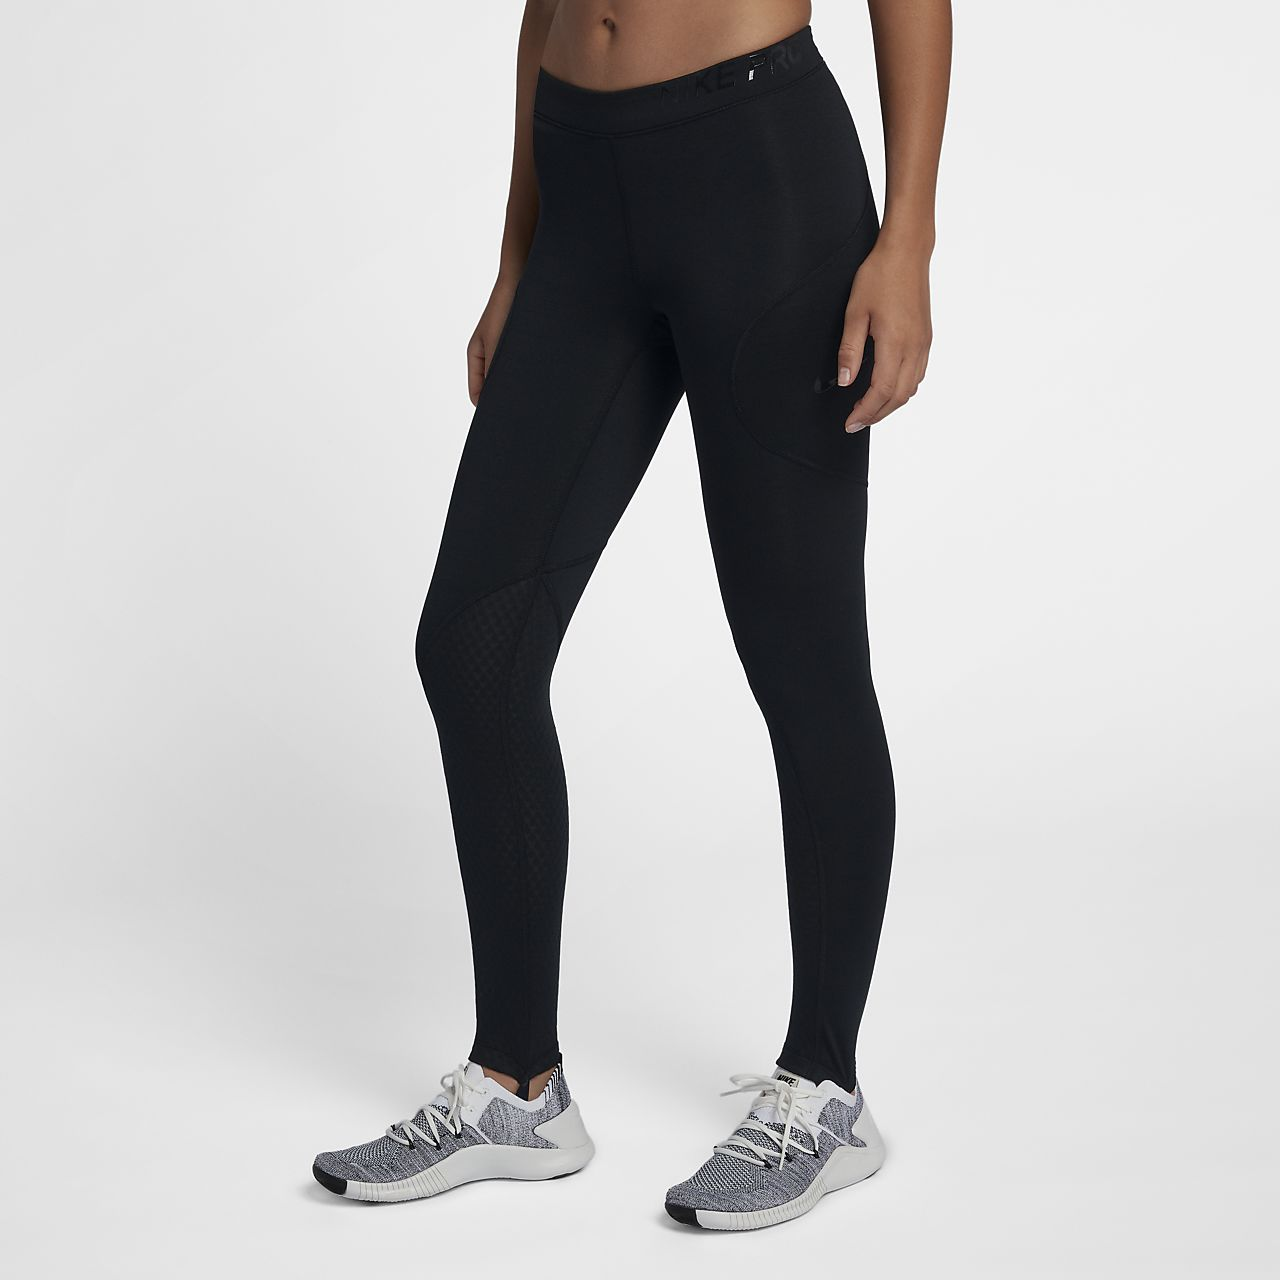 Nike Pro HyperWarm Malles - Dona